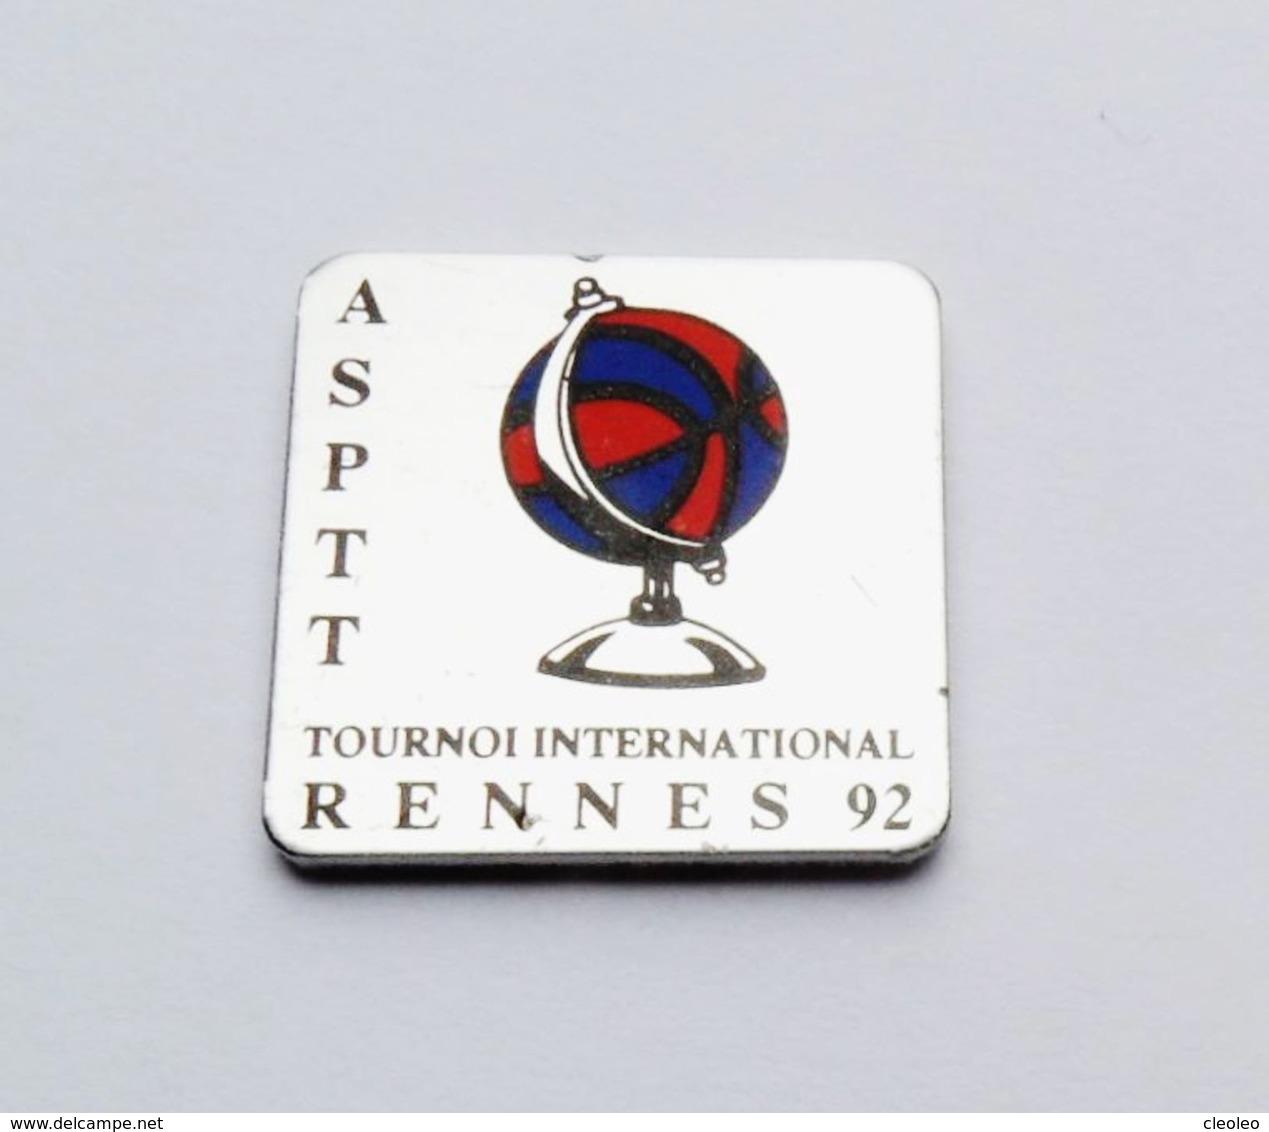 Pin's ASPPT Tournoi International Rennes 92 - BR3/5 - Villes